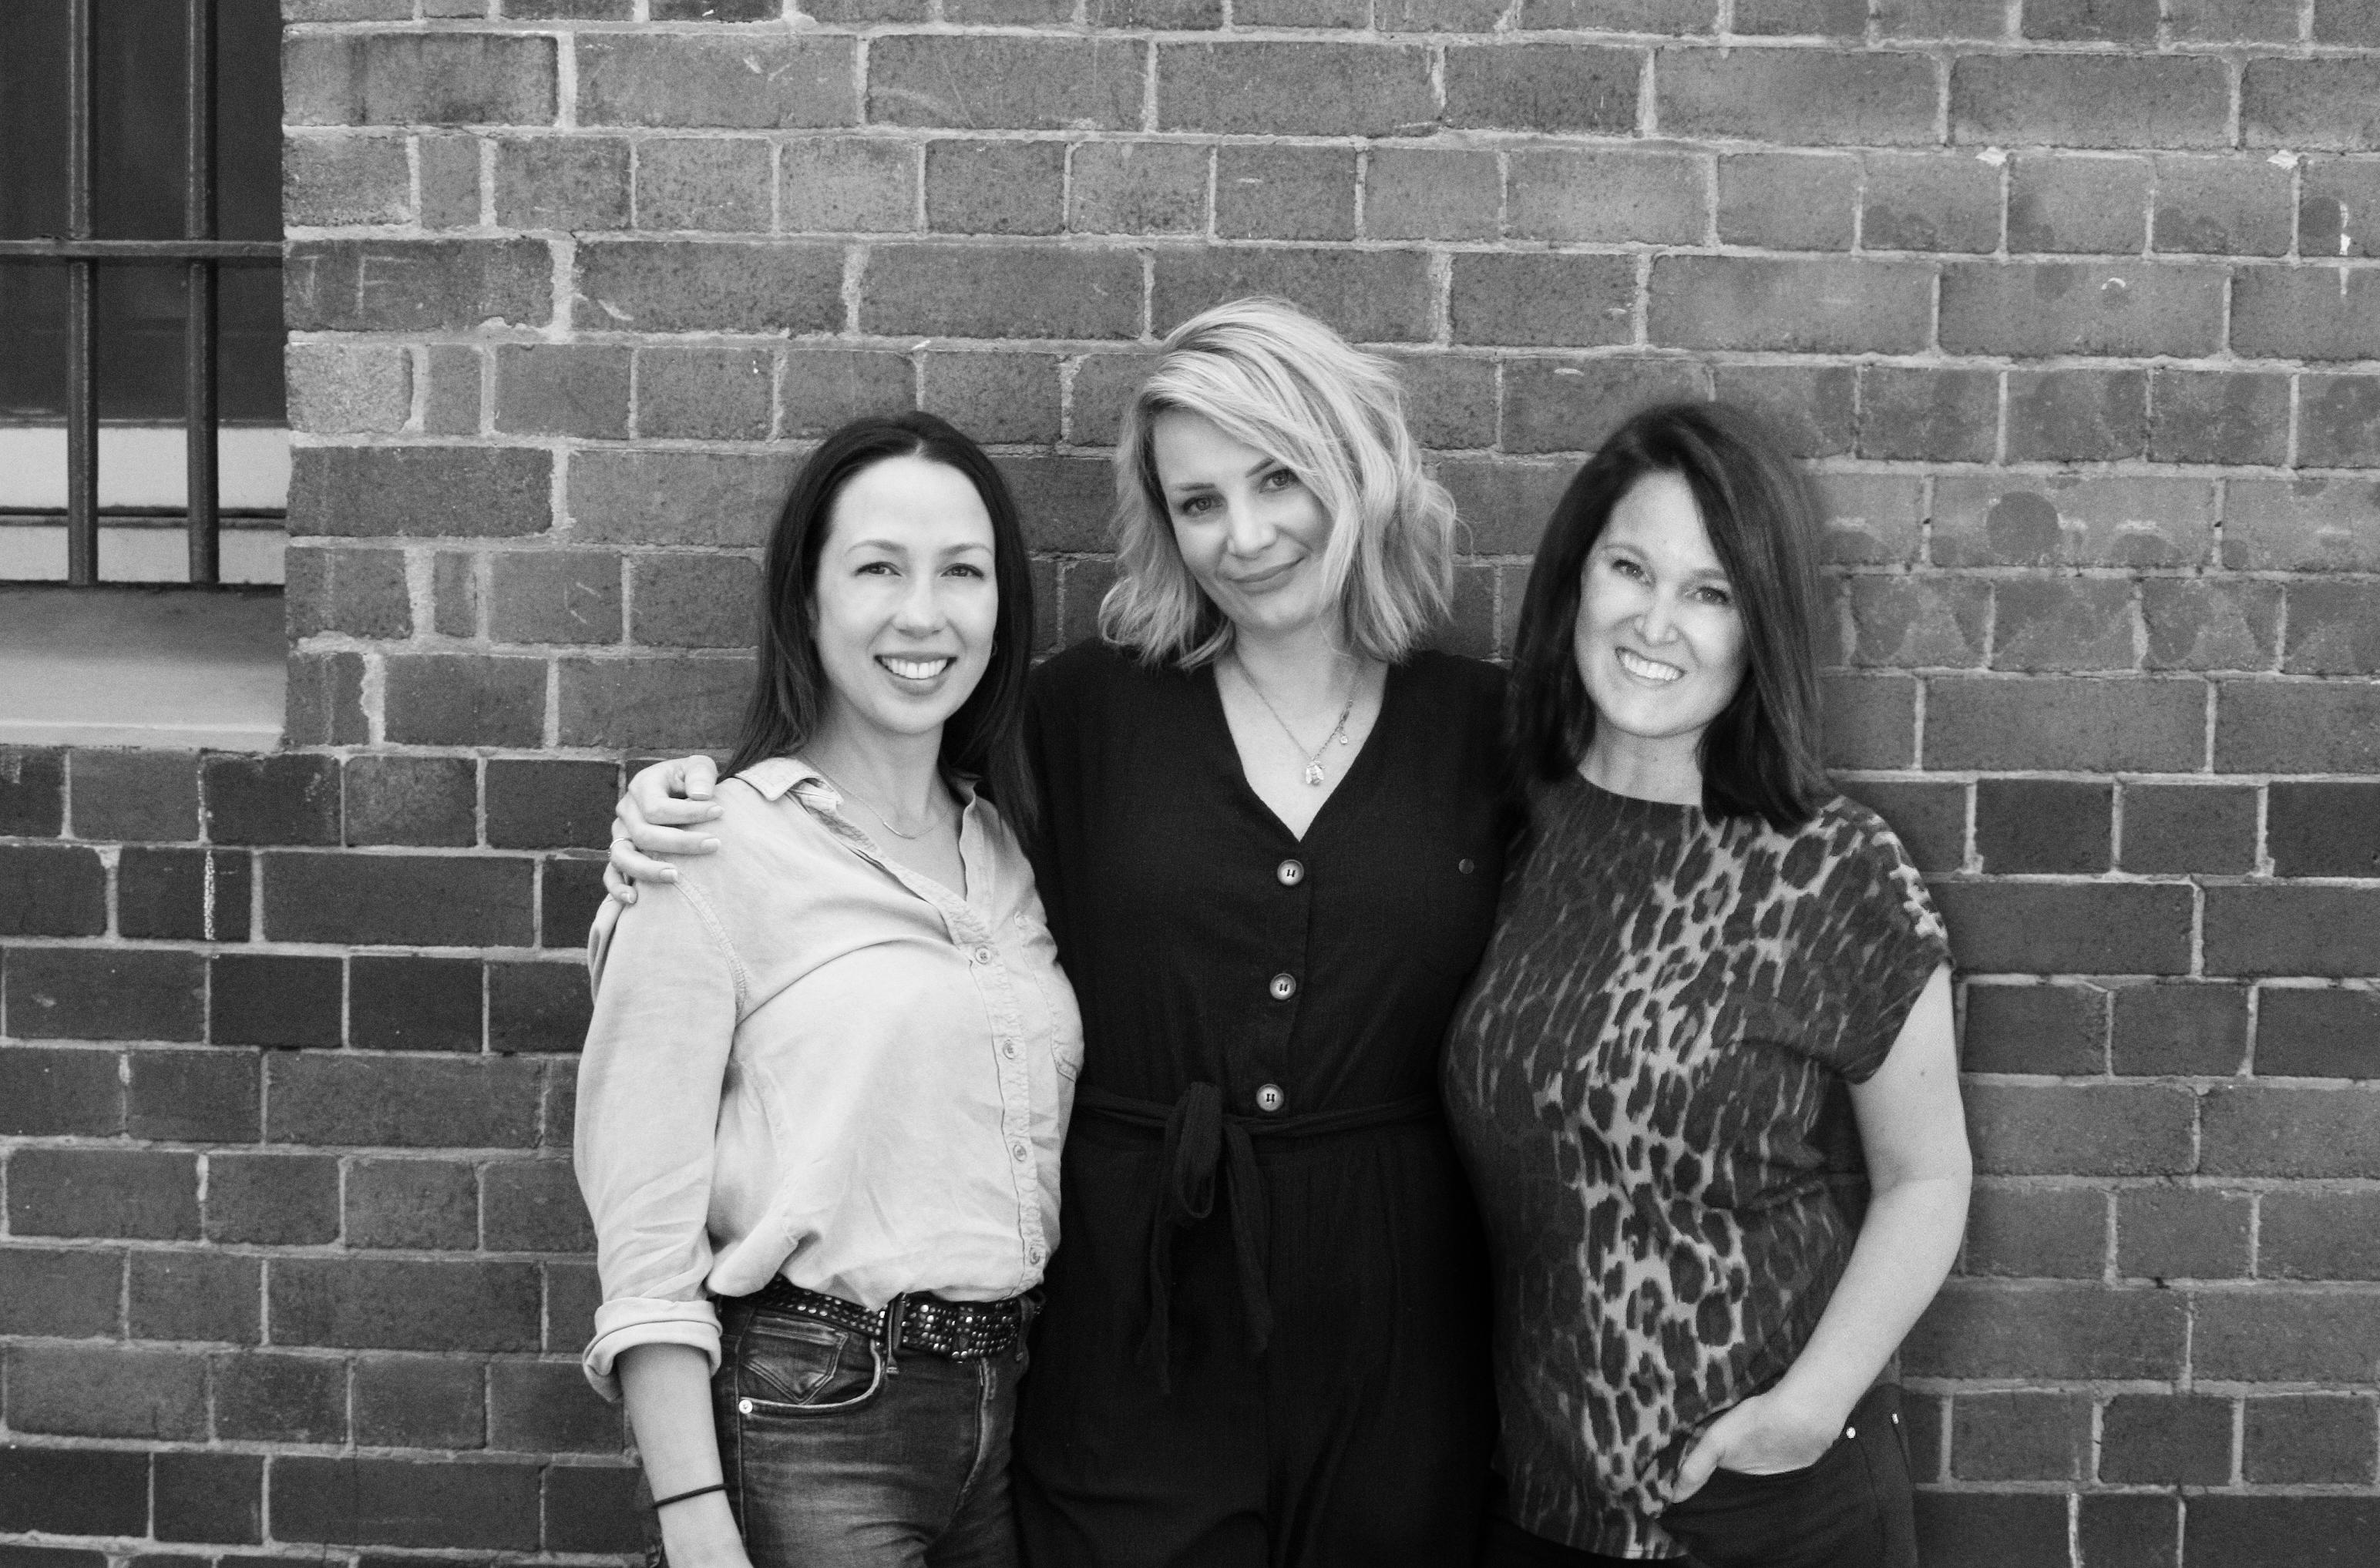 Saatchi & Saatchi Sydney appoints Deb Munro, Greer Macpherson and Kim Avetta to production leadership team